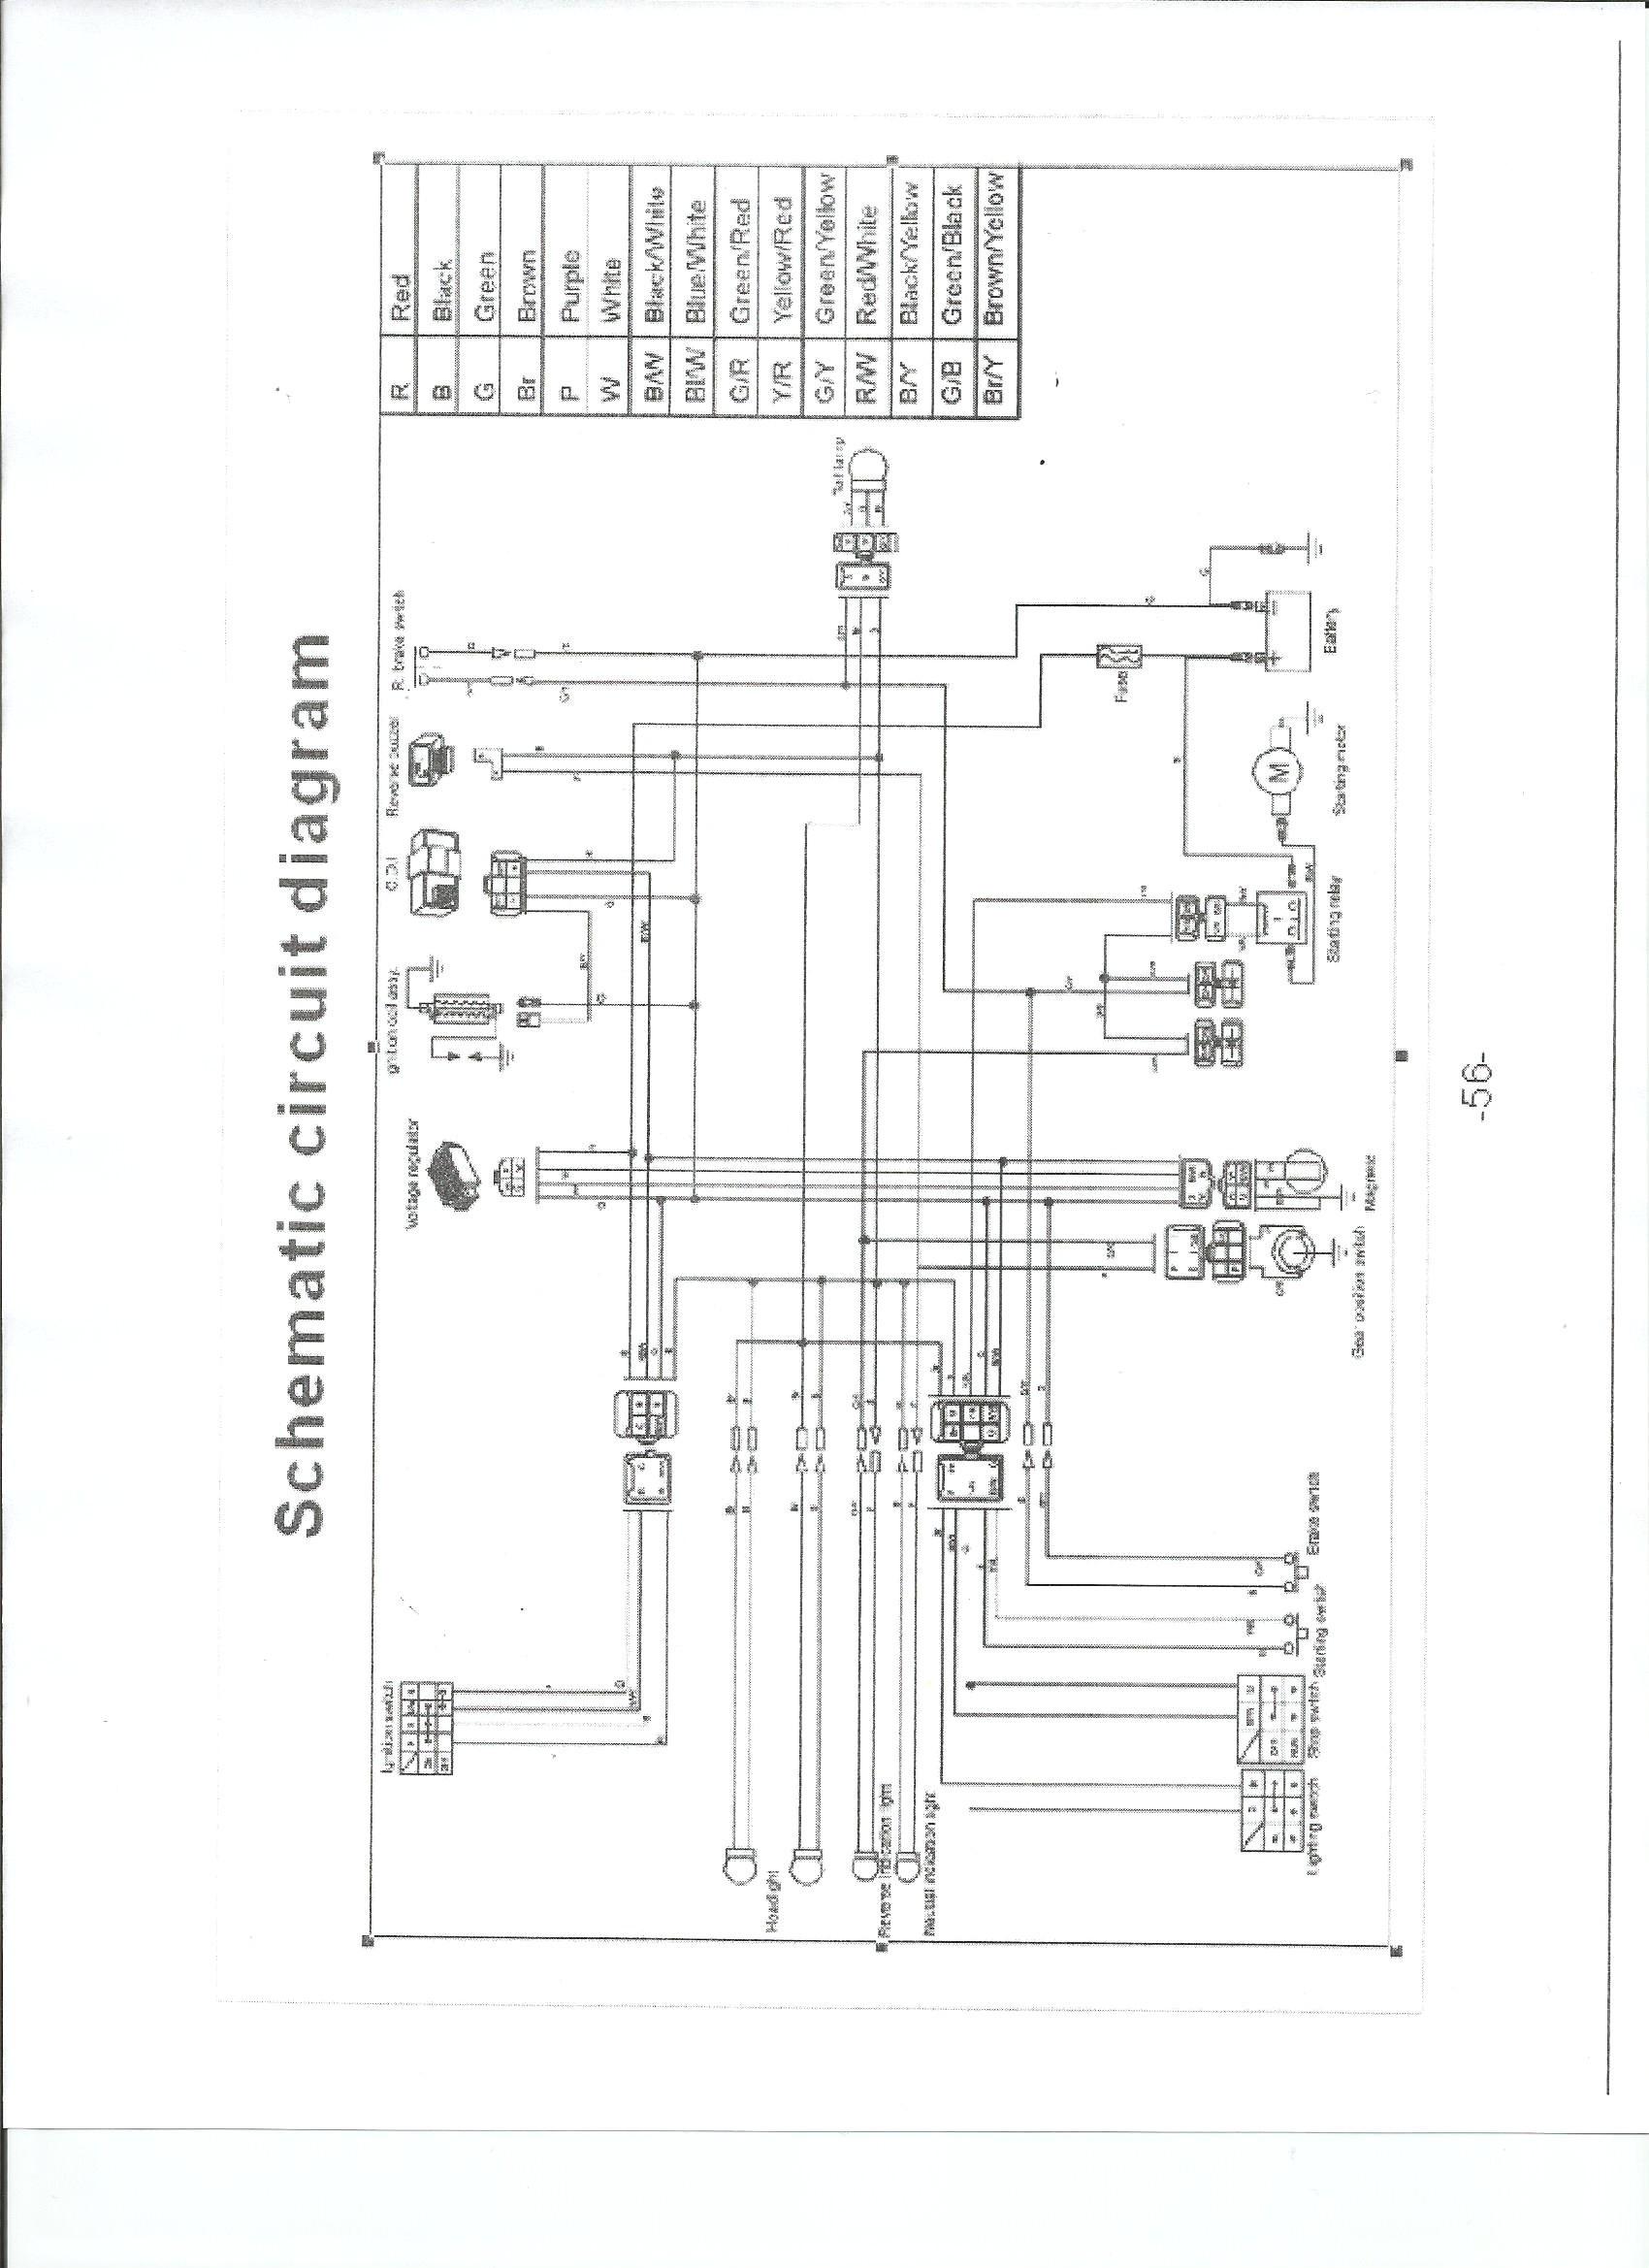 Tao tao 110 atv wiring diagram wiring diagram image chinese atv wiring diagram 110 fresh taotao 110 atv wiring diagram swarovskicordoba Gallery